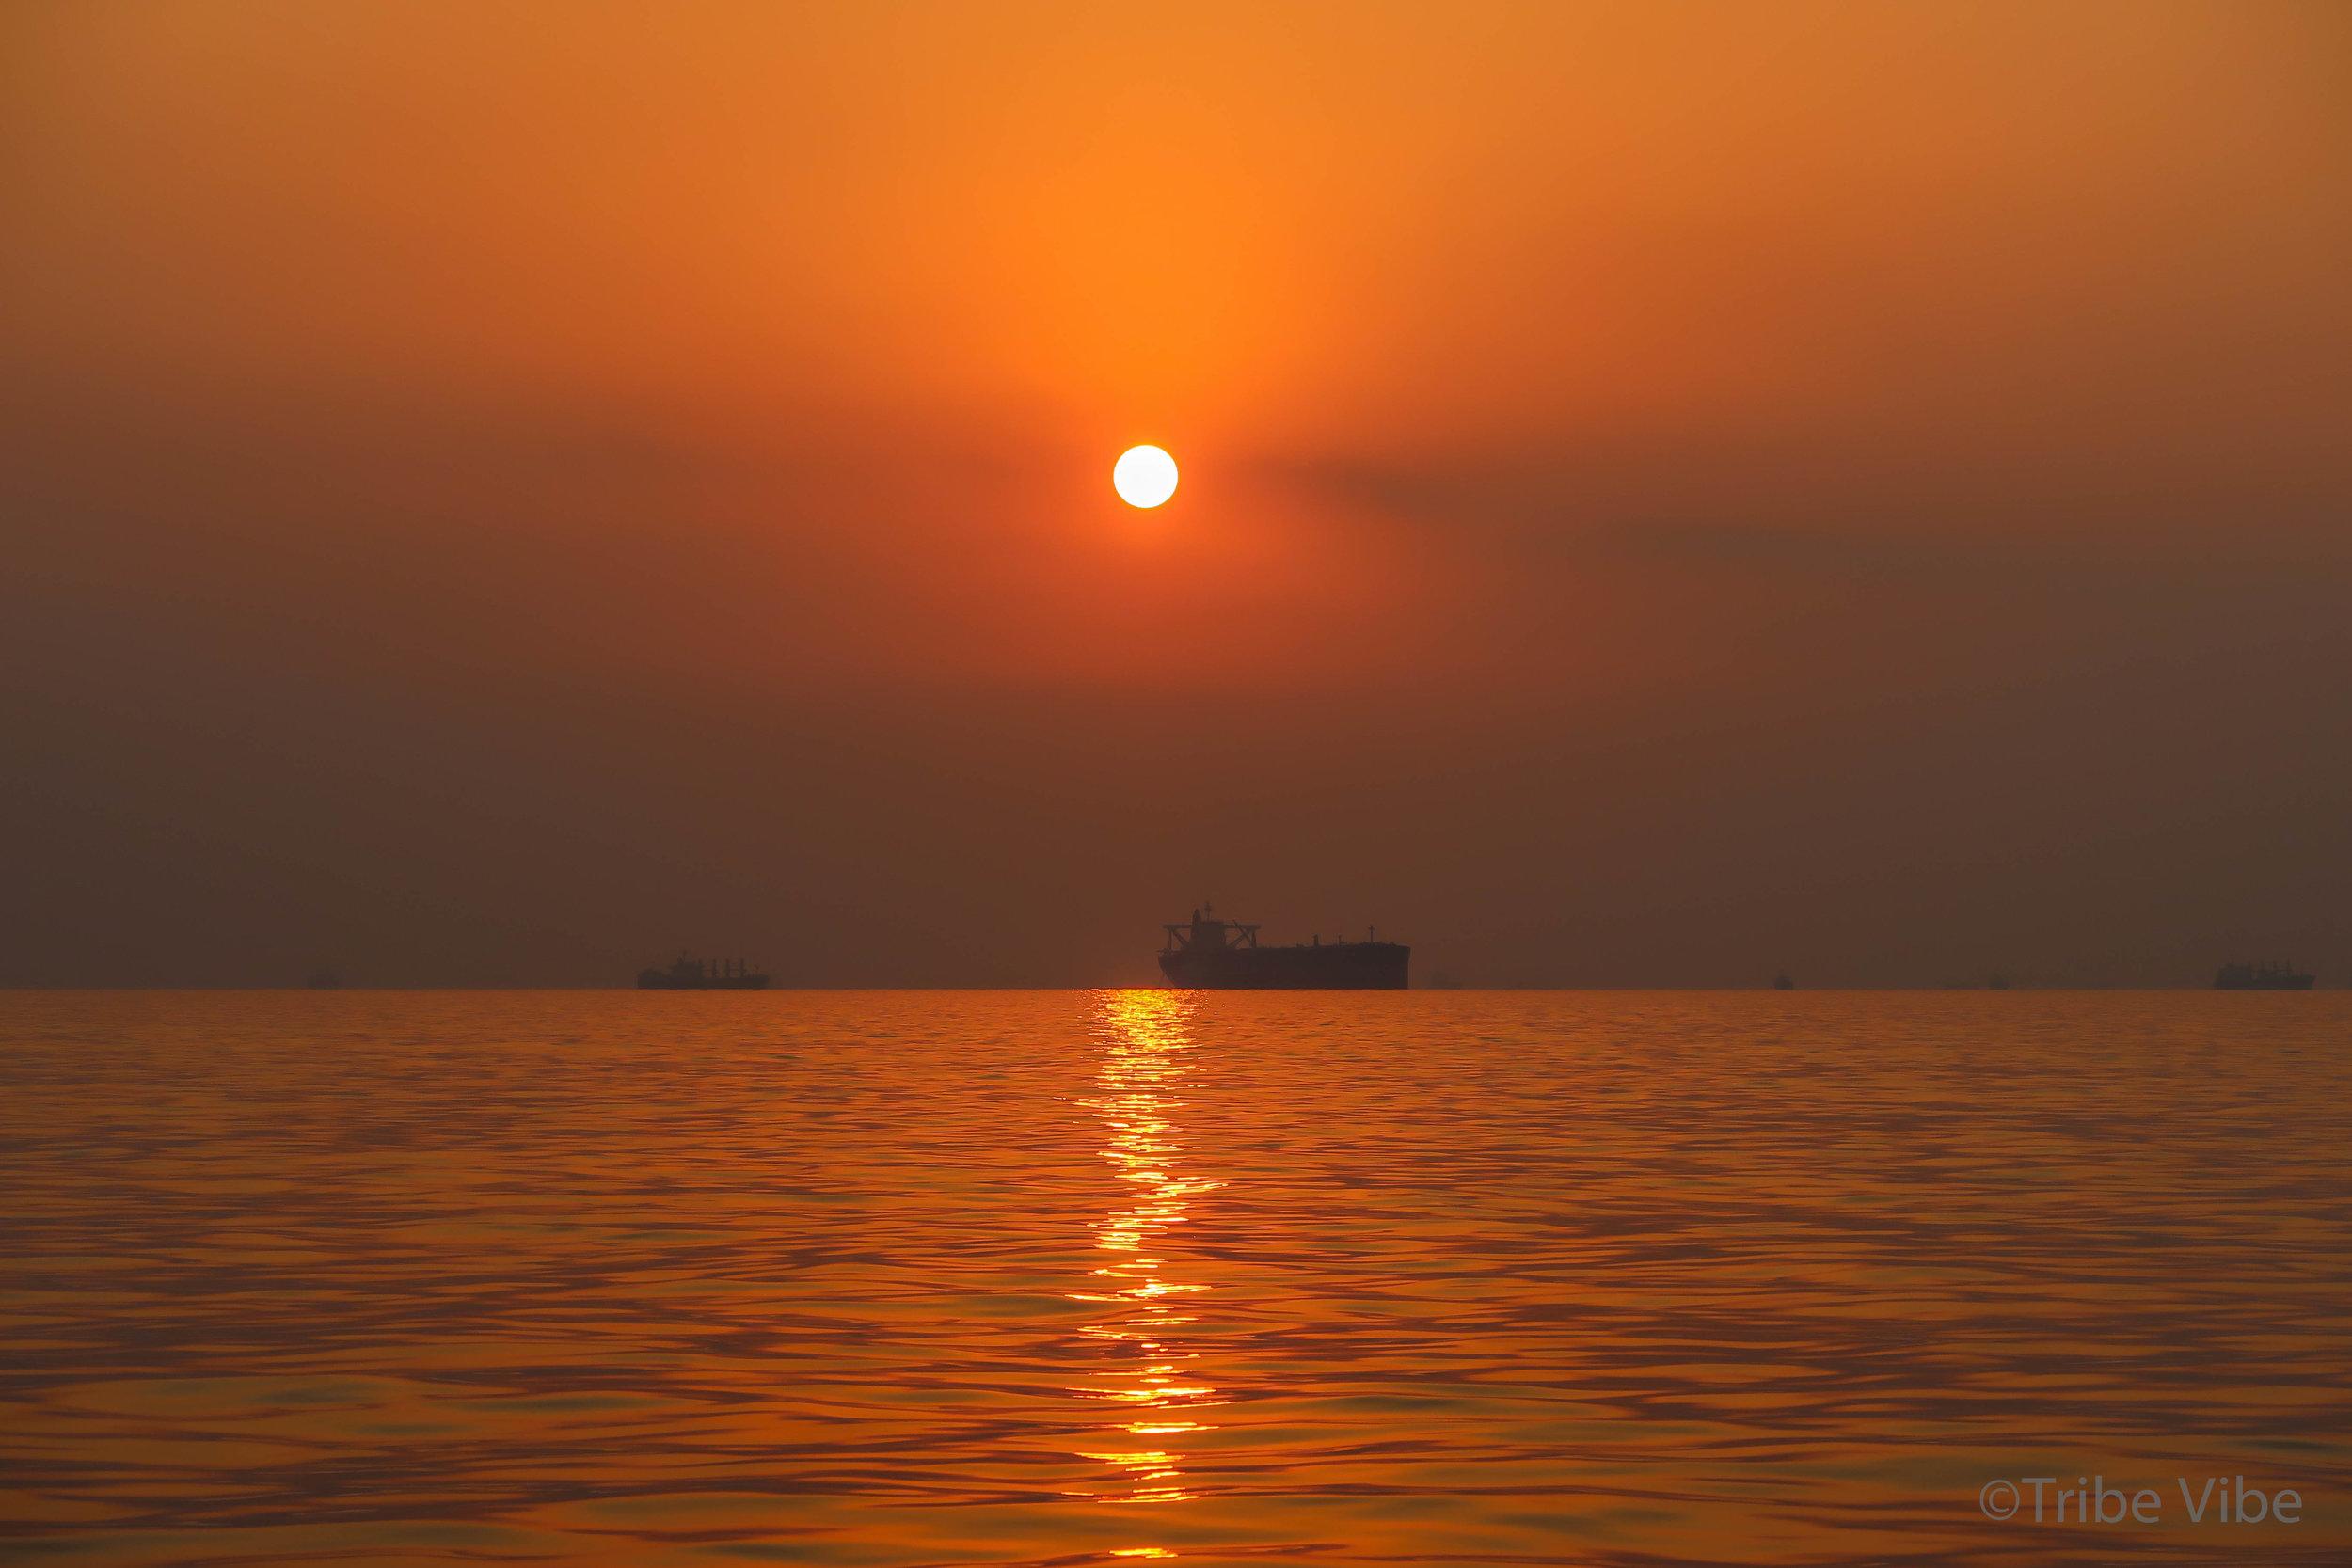 Breathtaking Arabian sunsets